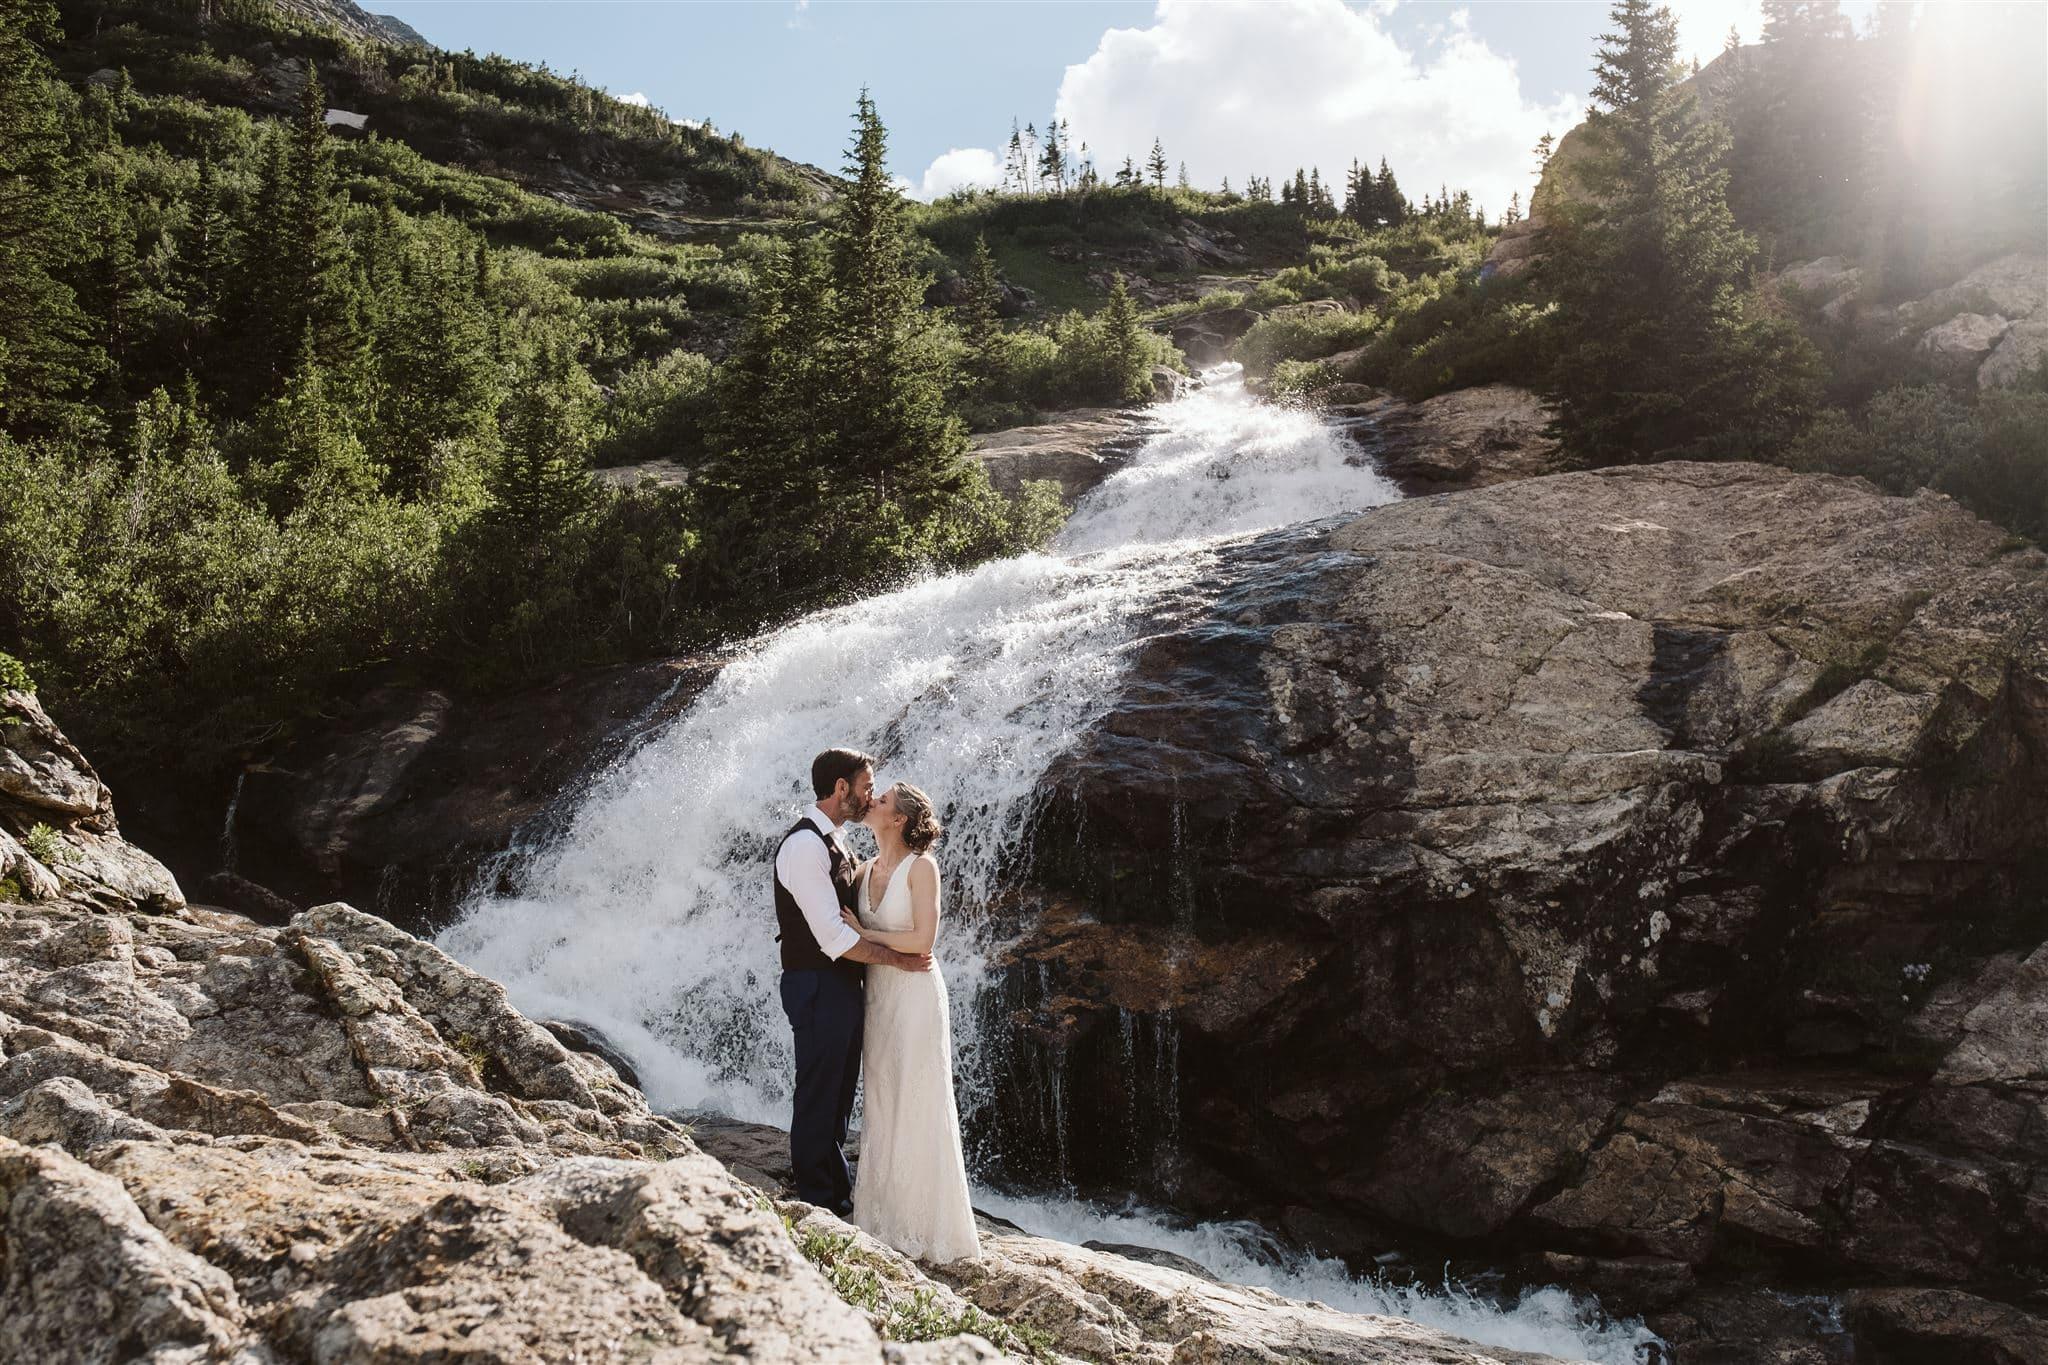 Waterfall elopement in Breckenridge, Colorado